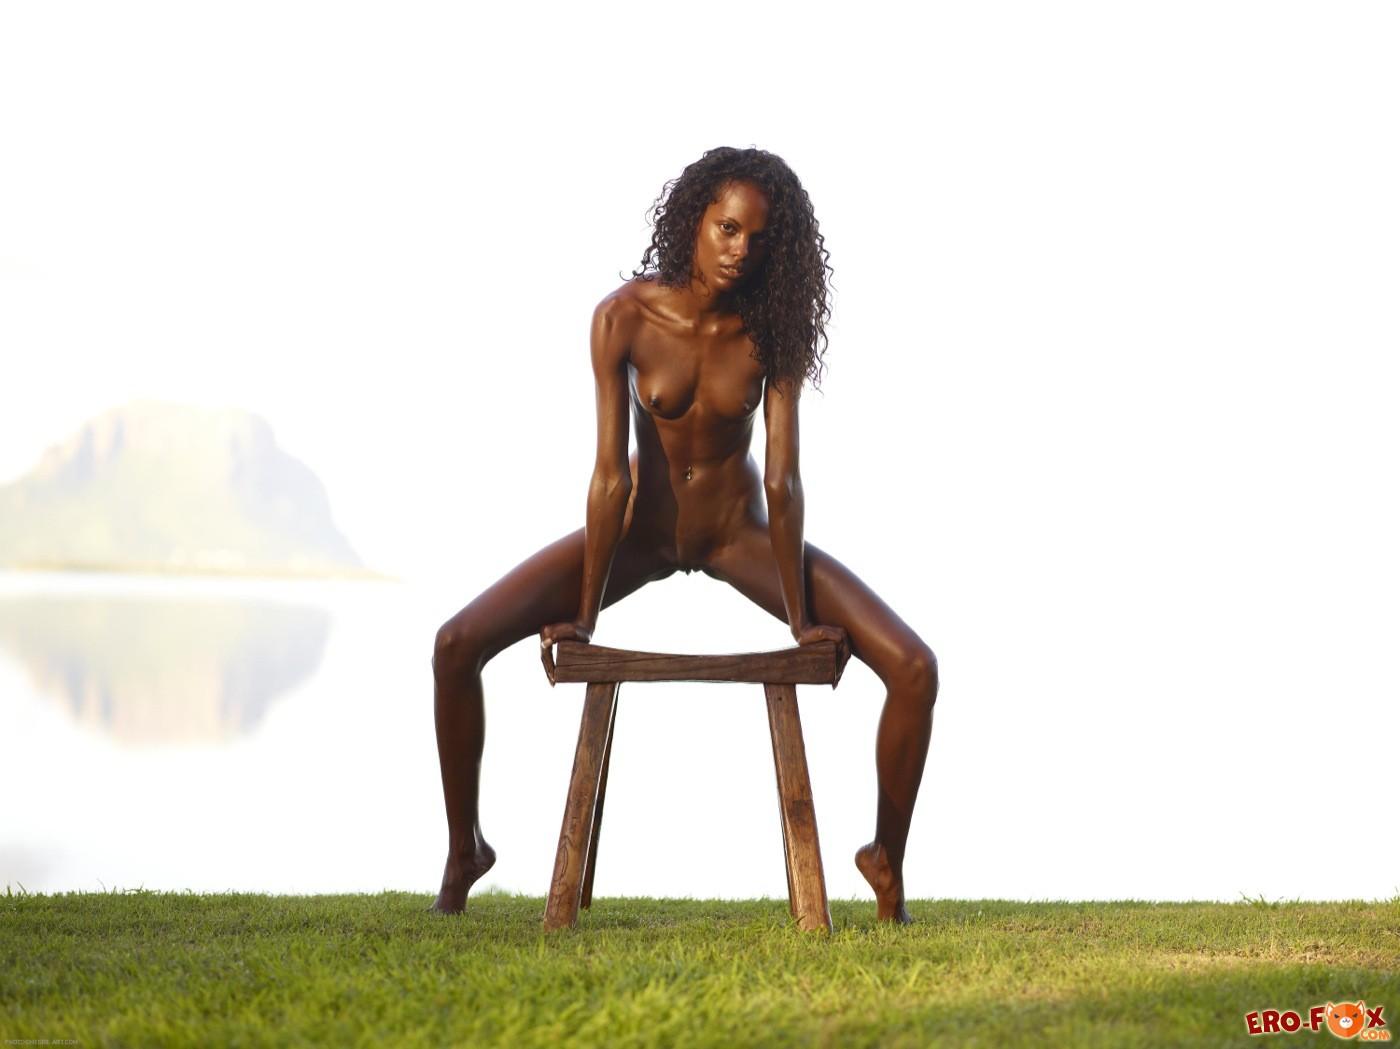 Худая негритянка голая на табуретке - фото